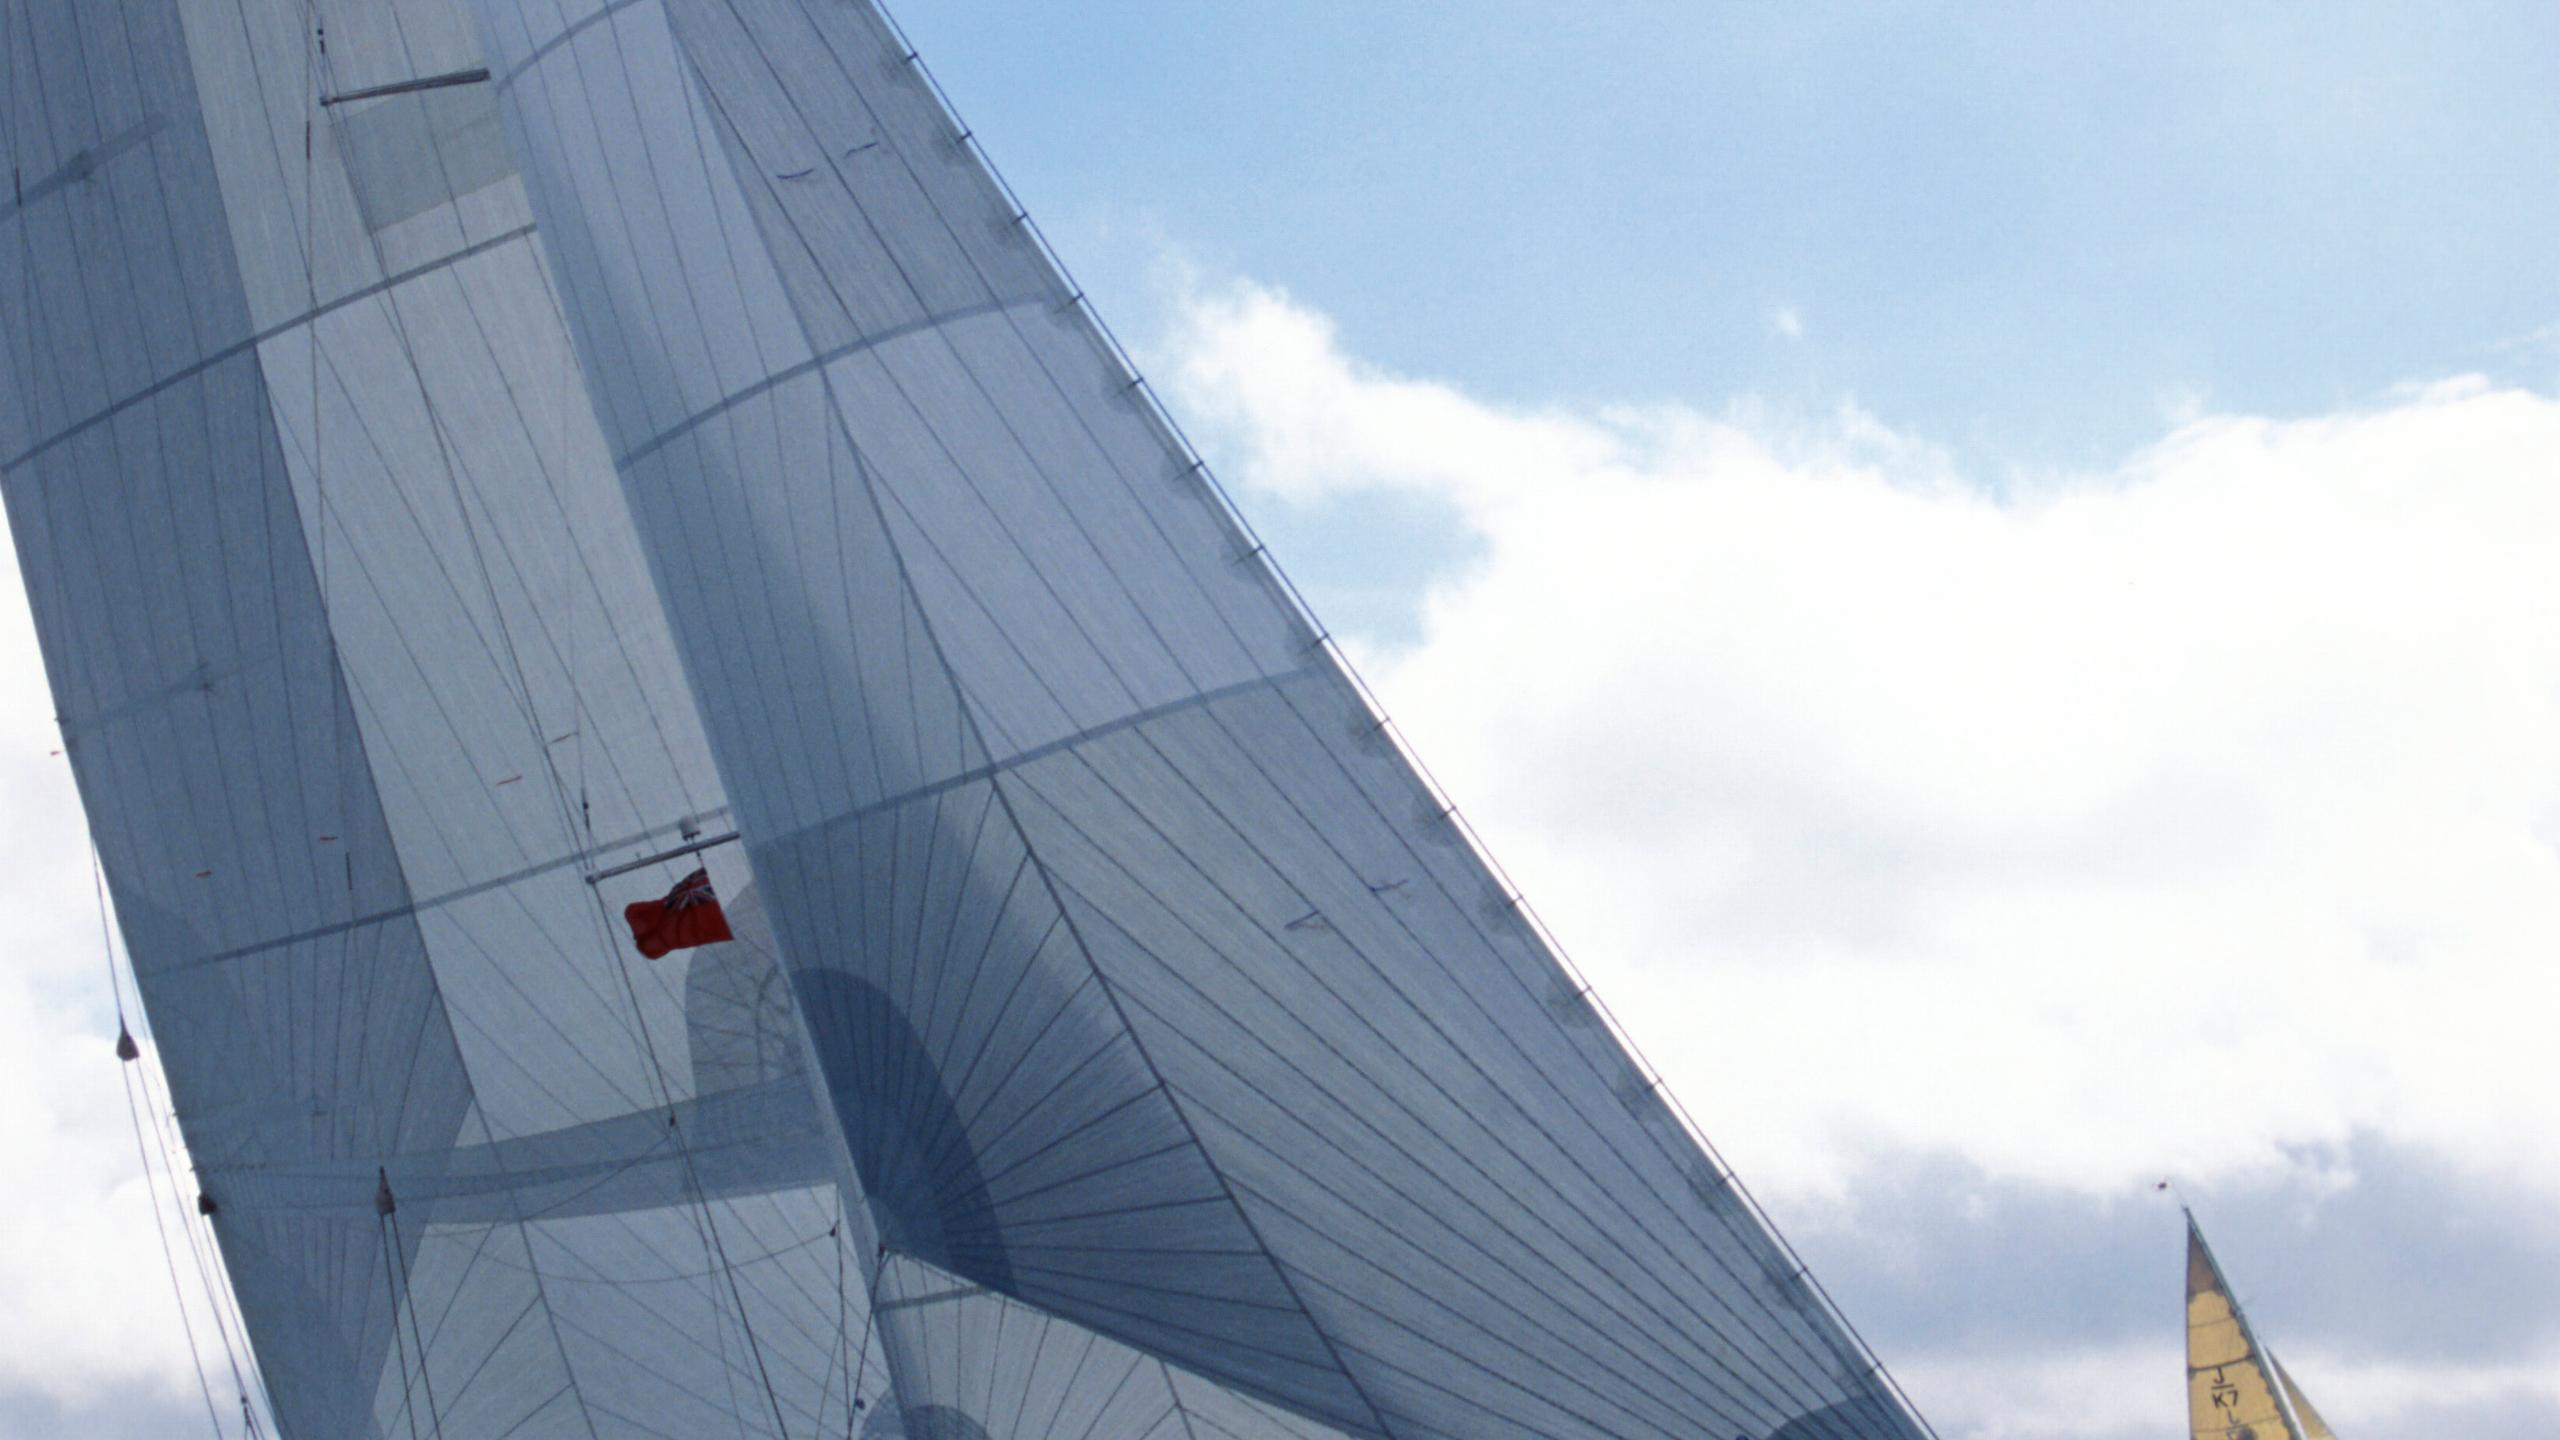 endeavour-classic-saling-yacht-camper-nicholsons-1934-40m-cruising